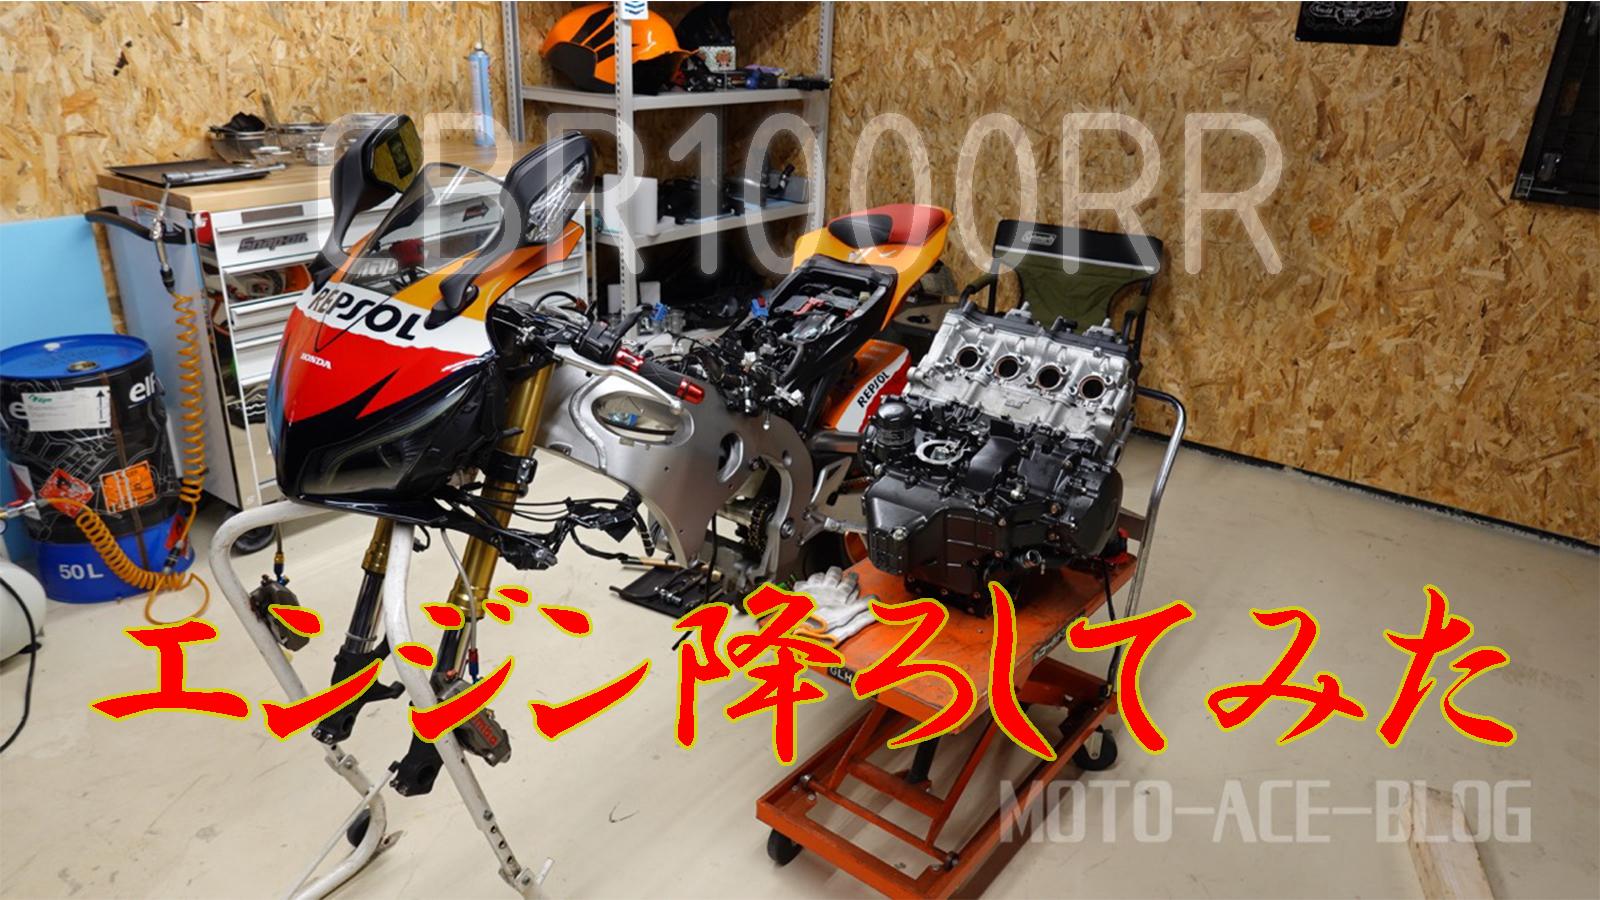 CBR1000RR(SC59)エンジン降ろし整備作業